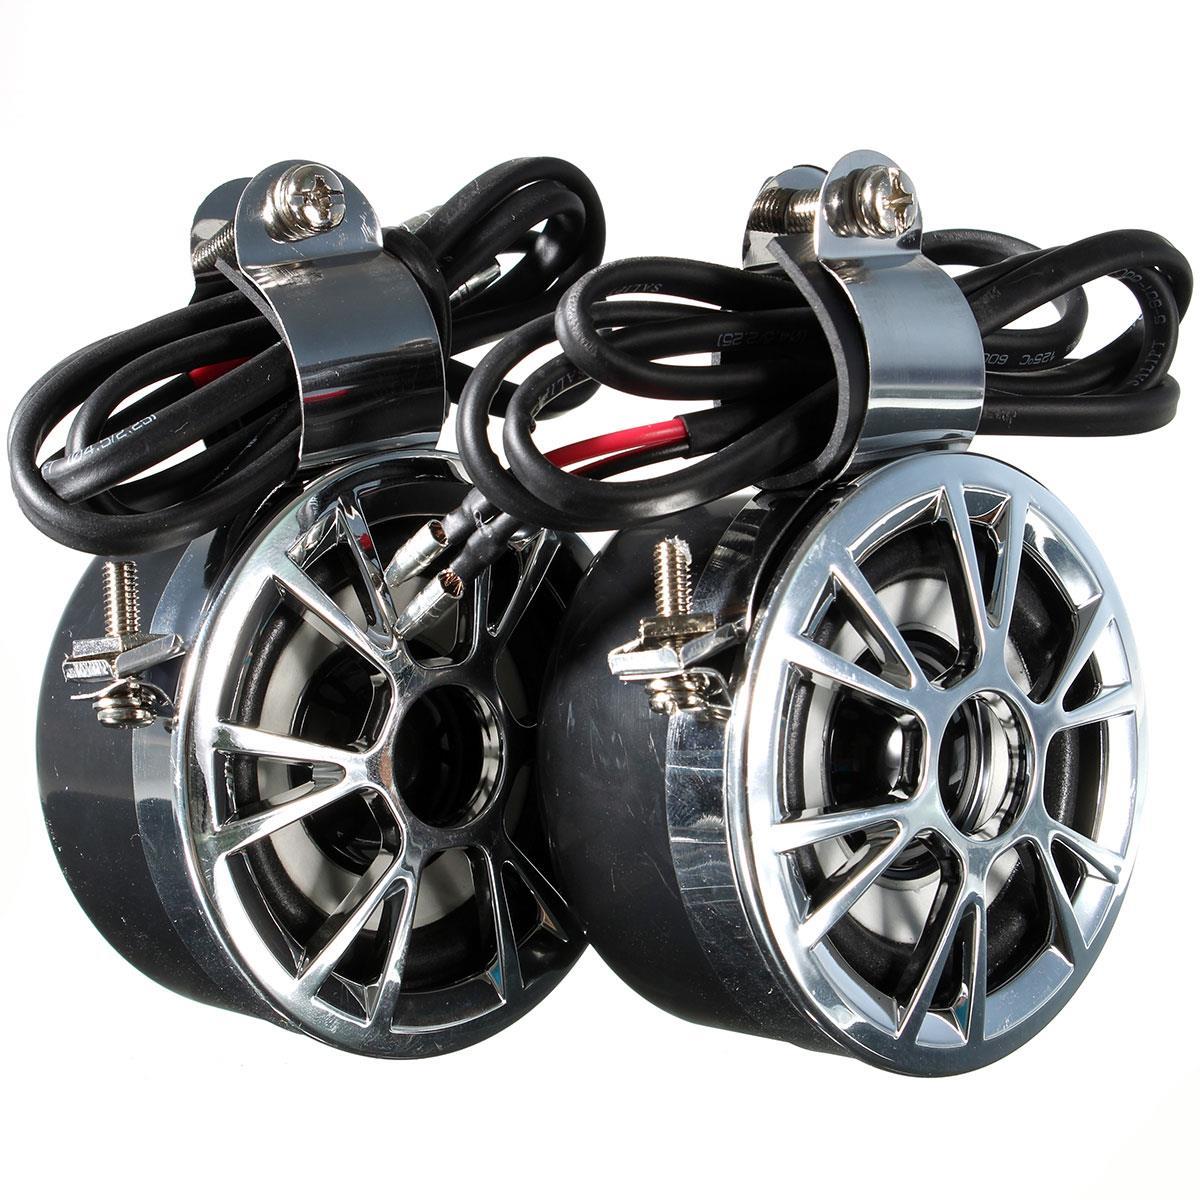 online kaufen gro handel motorrad lautsprecher aus china. Black Bedroom Furniture Sets. Home Design Ideas